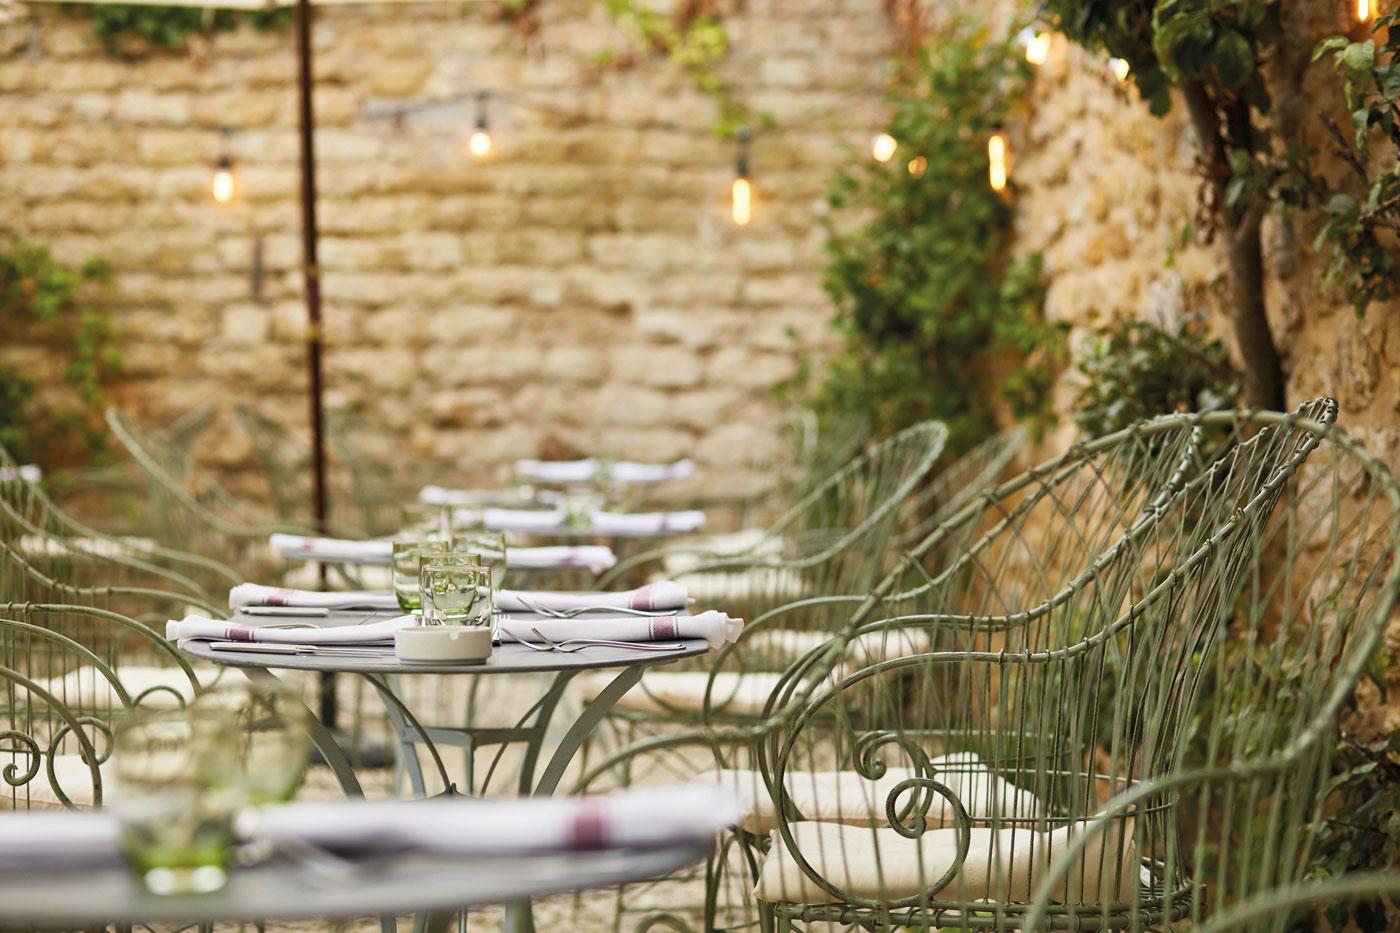 Lord Poulett courtyard